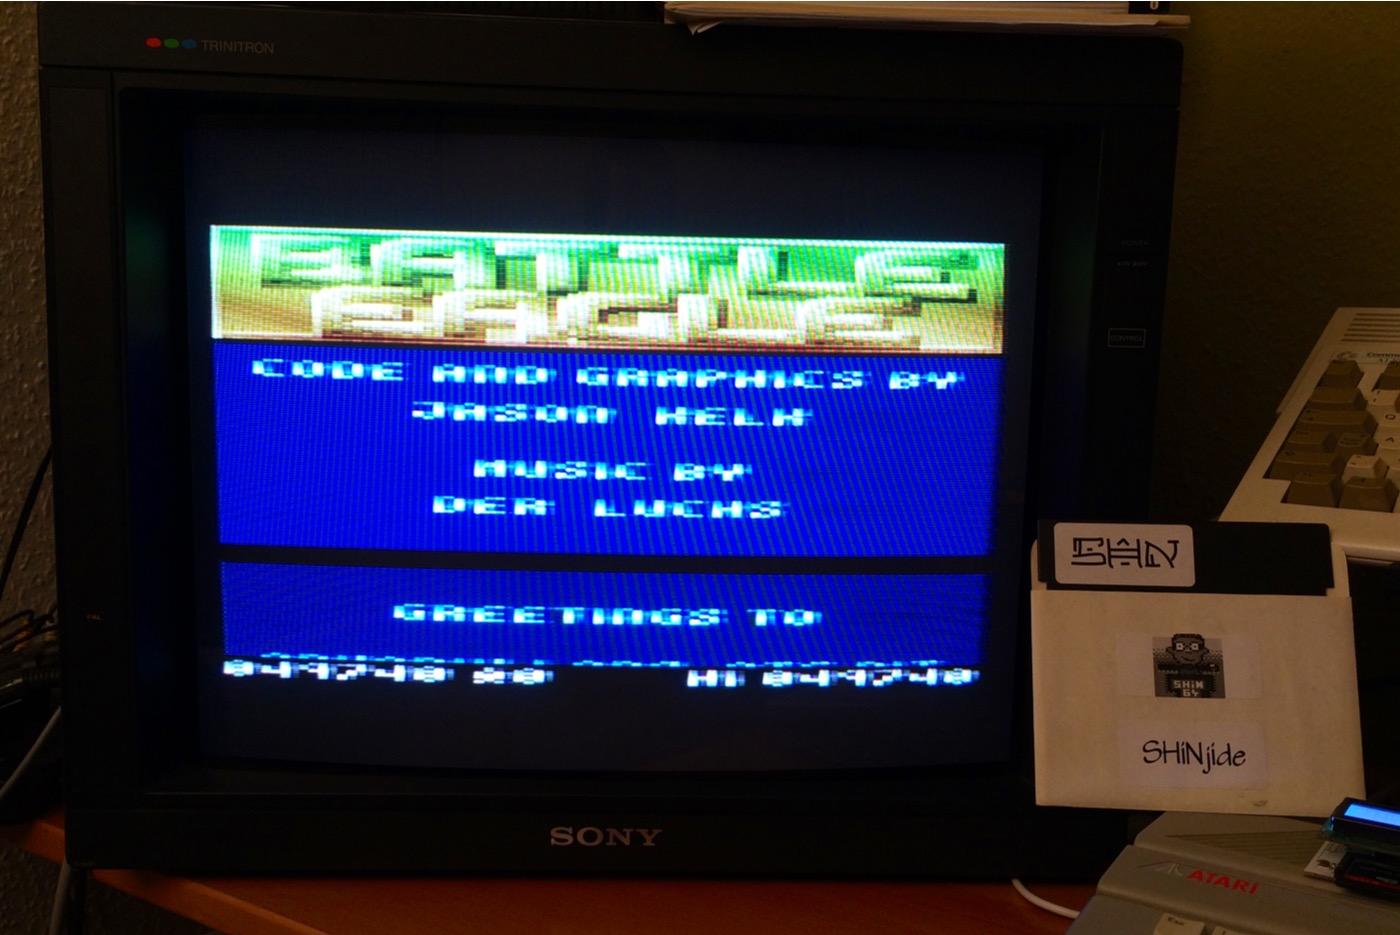 SHiNjide: Battle Eagle (Atari 400/800/XL/XE) 49,740 points on 2015-01-16 16:50:27